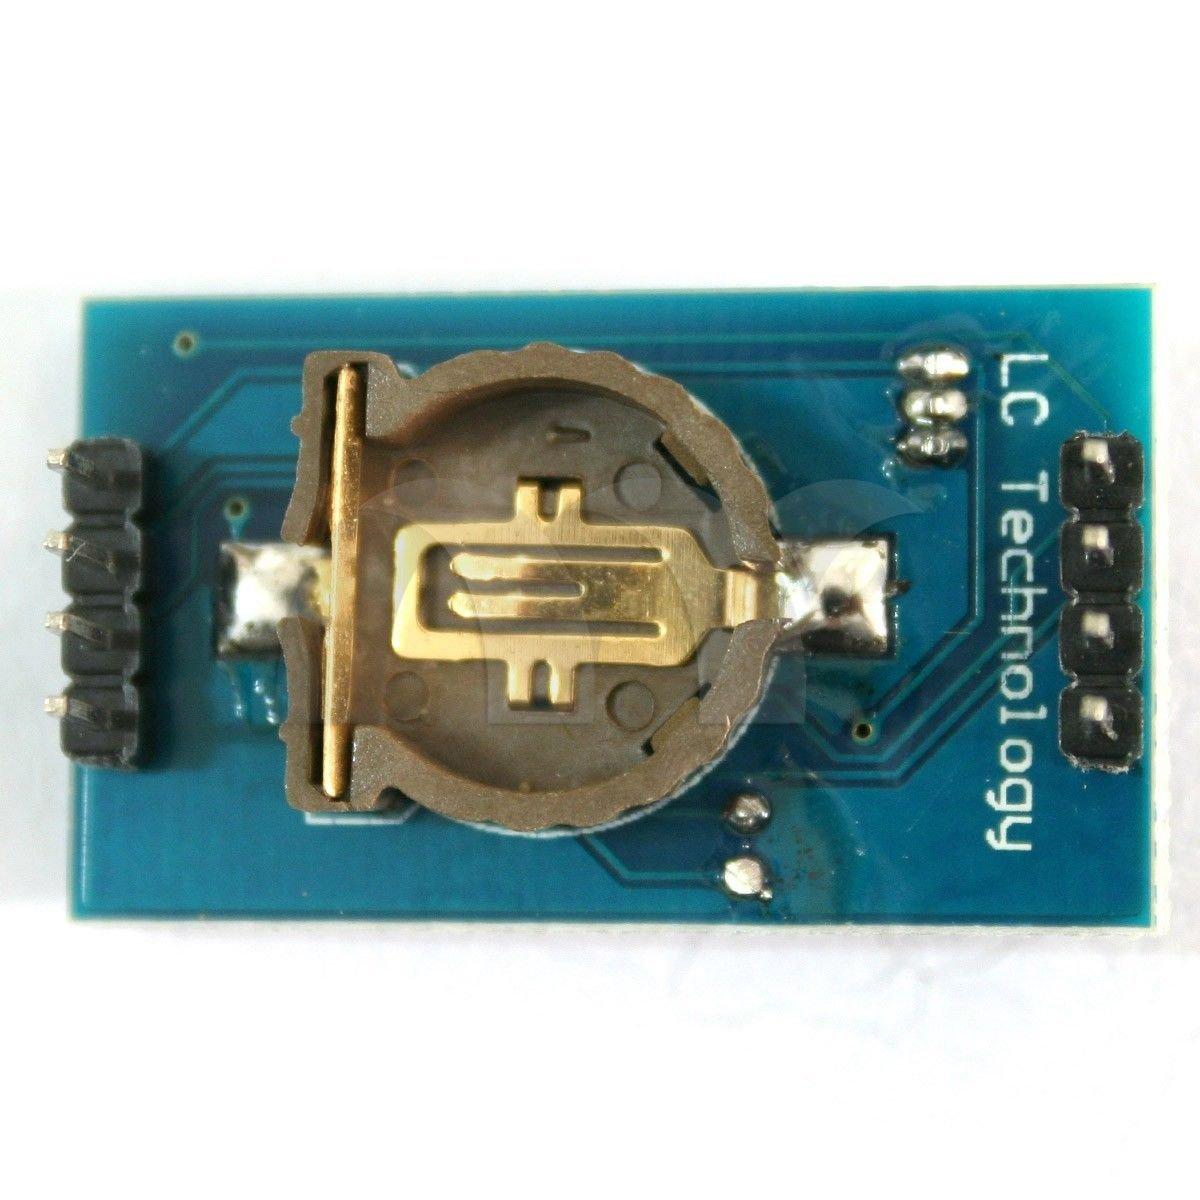 2 pcs DS1307+AT24C128+DS18B20 digital temperature sensor Triad Clock Module M35